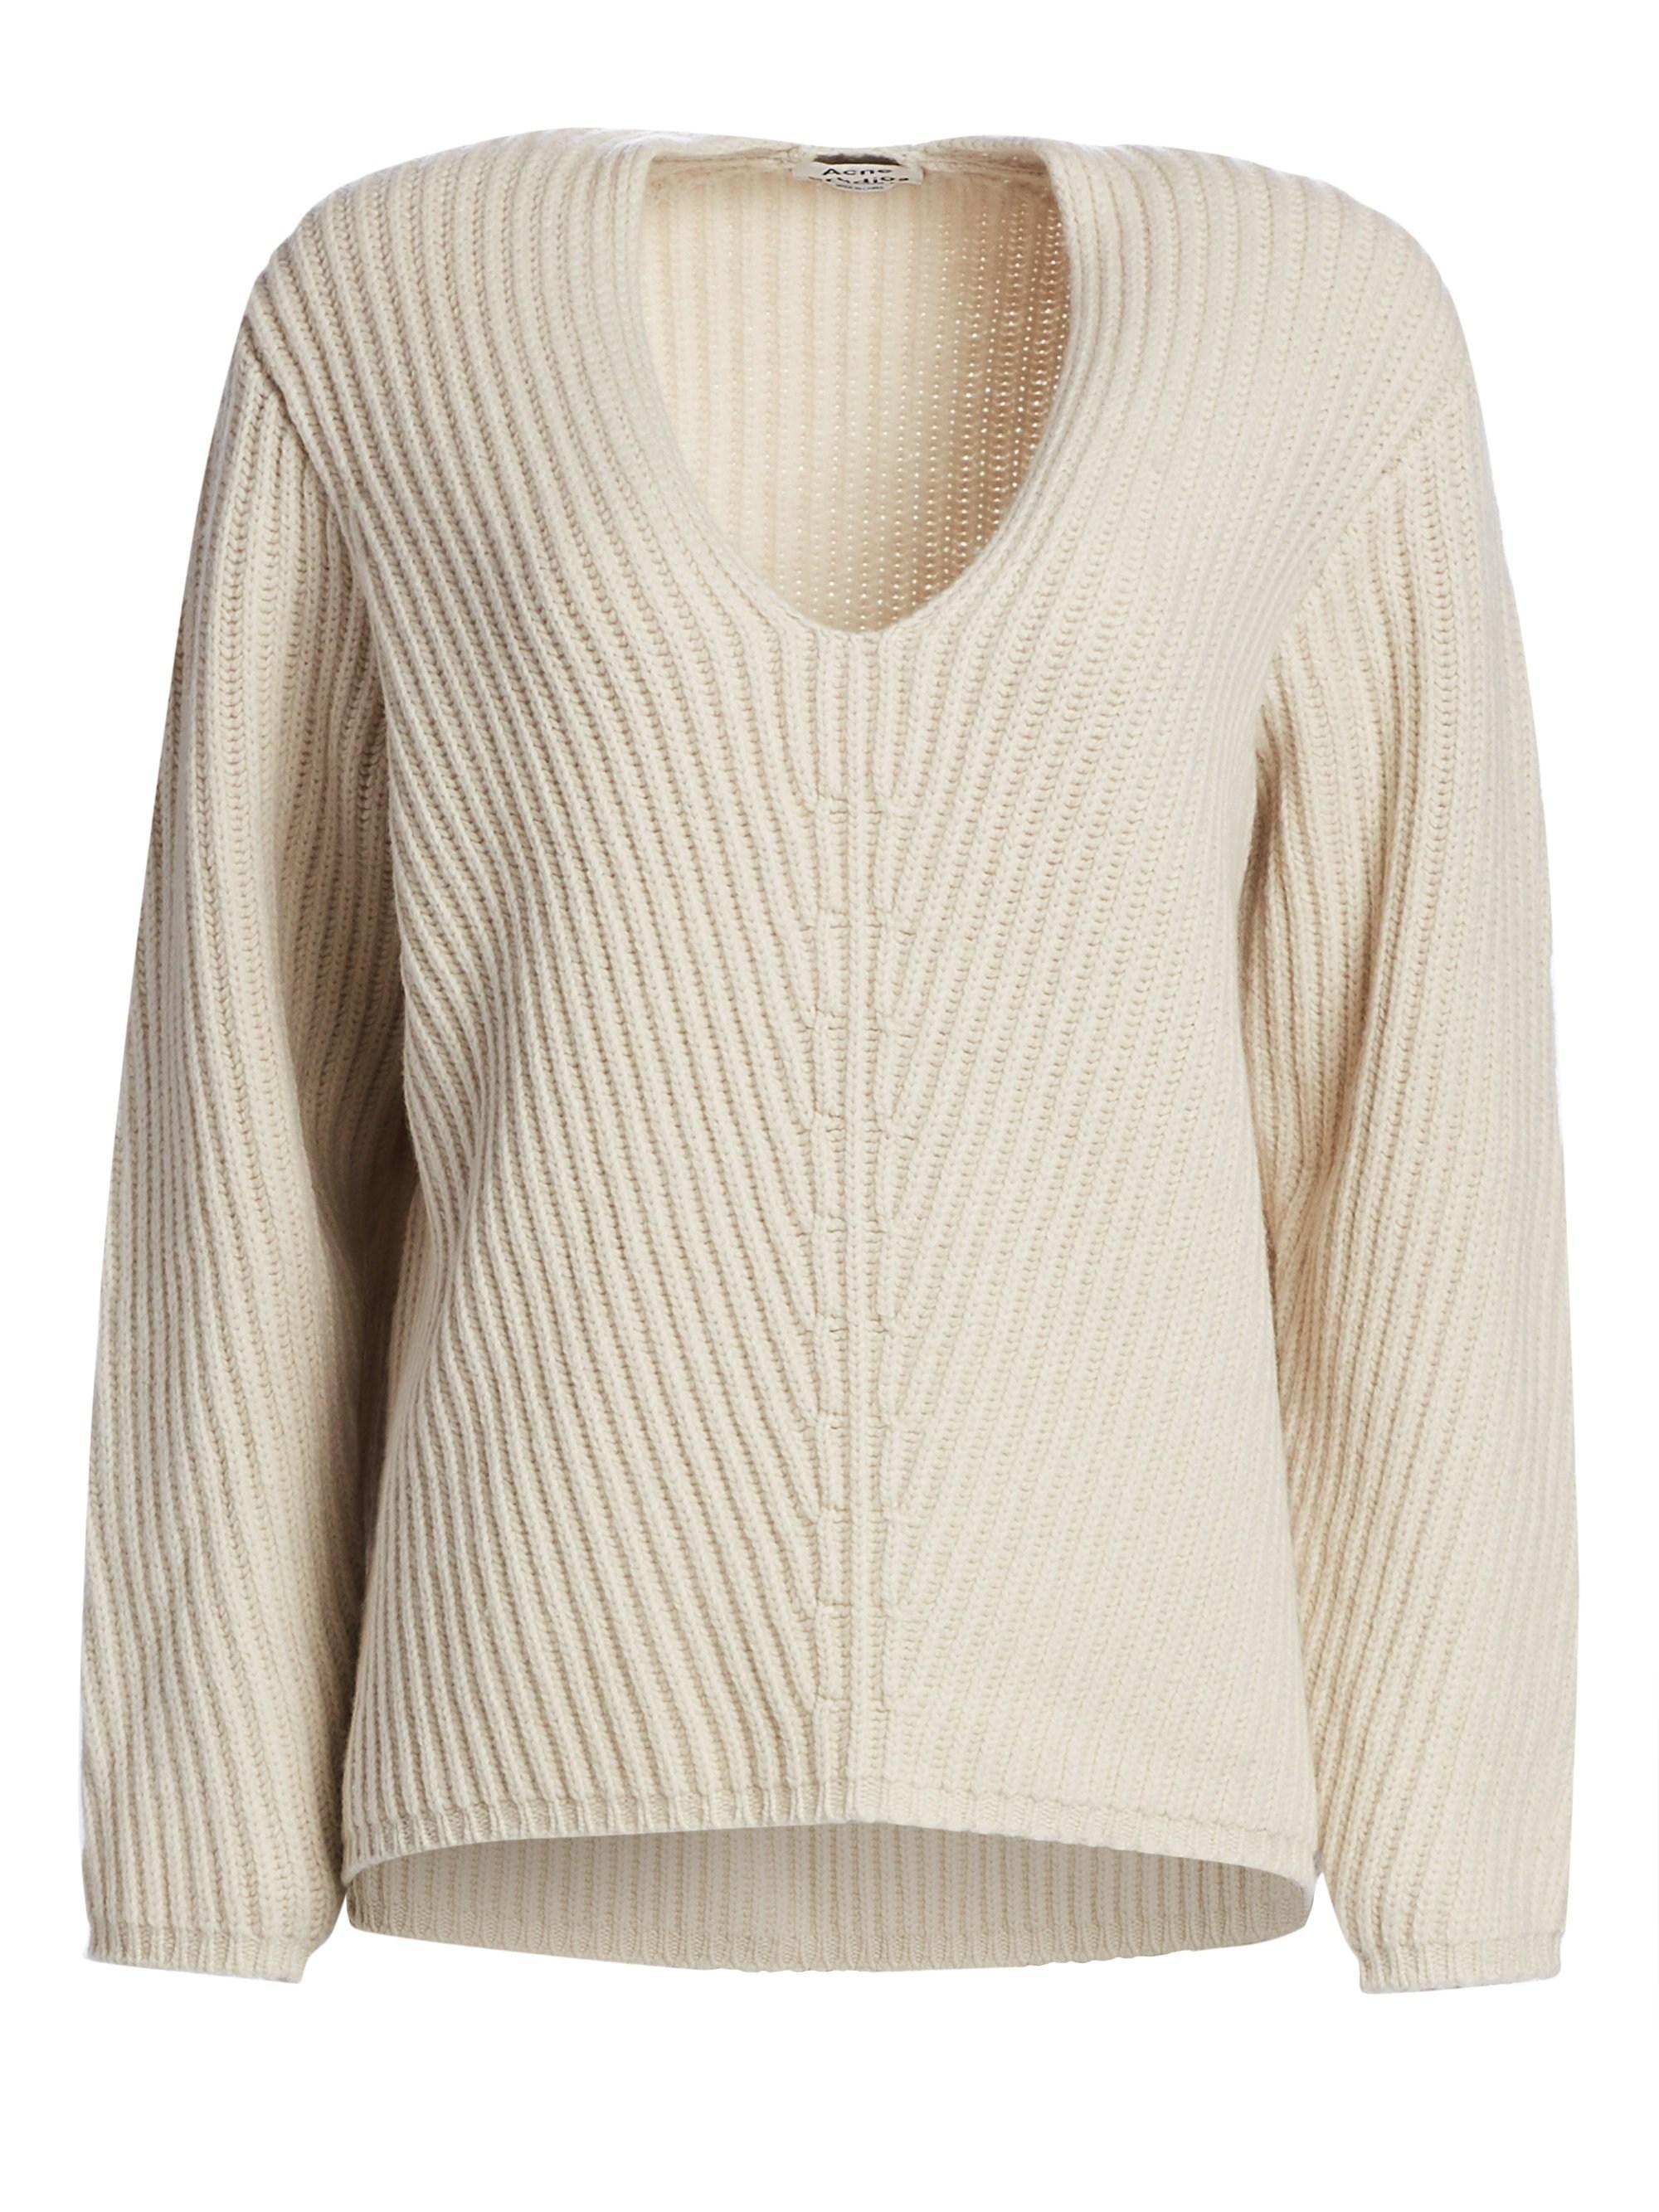 c6ff0f089cf7 Lyst - Acne Studios Wool V-neck Sweater